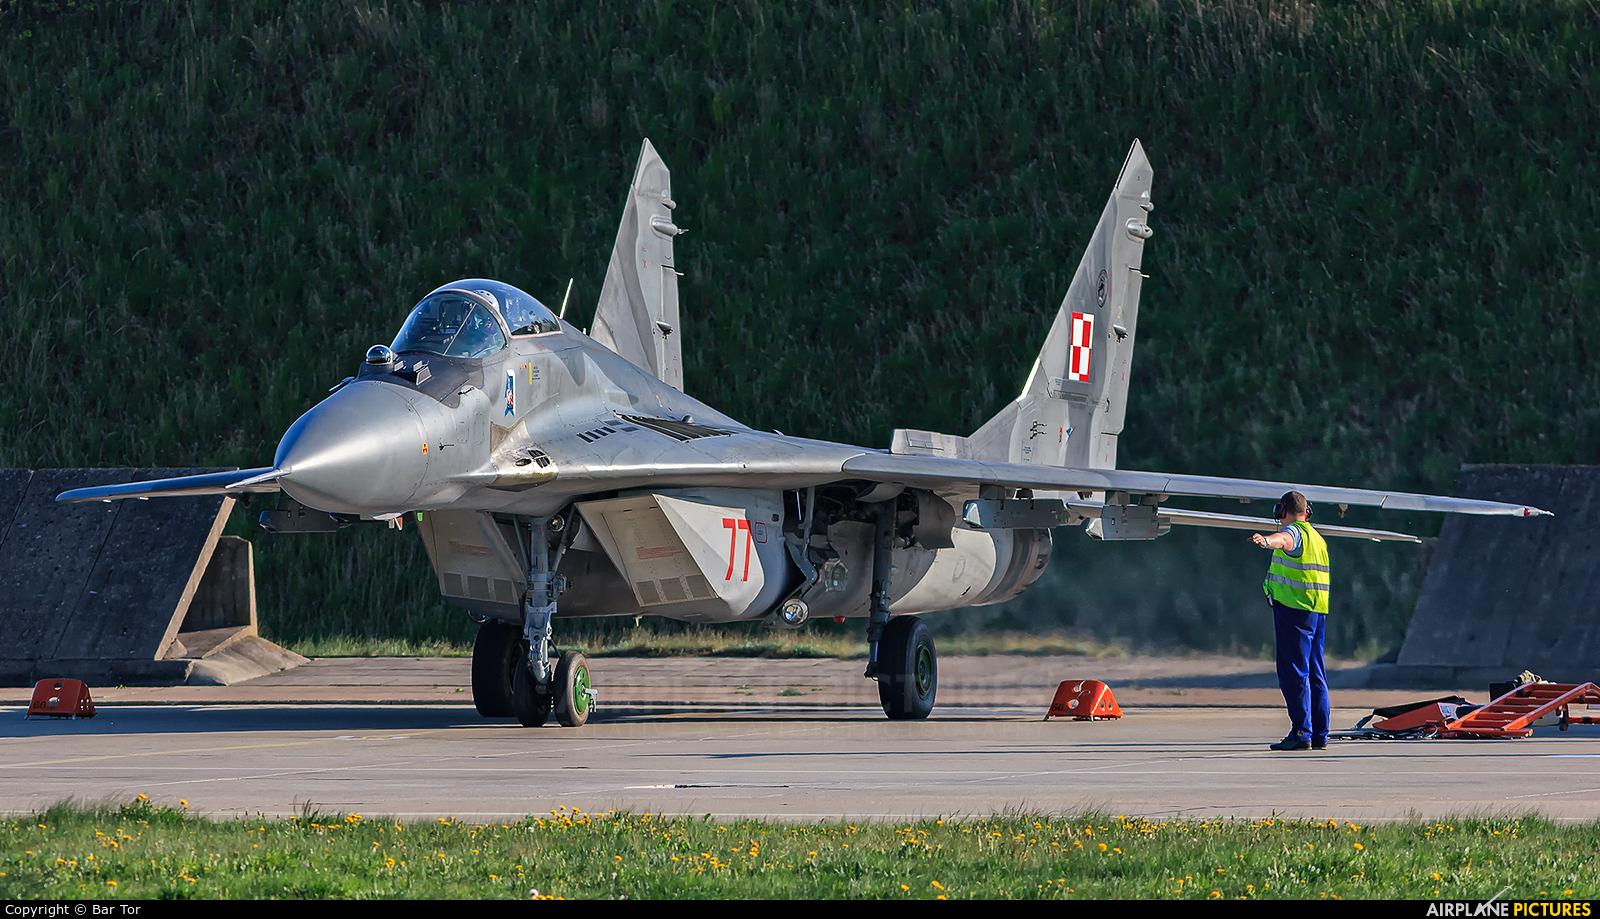 Poland - Air Force 77 aircraft at Mirosławiec